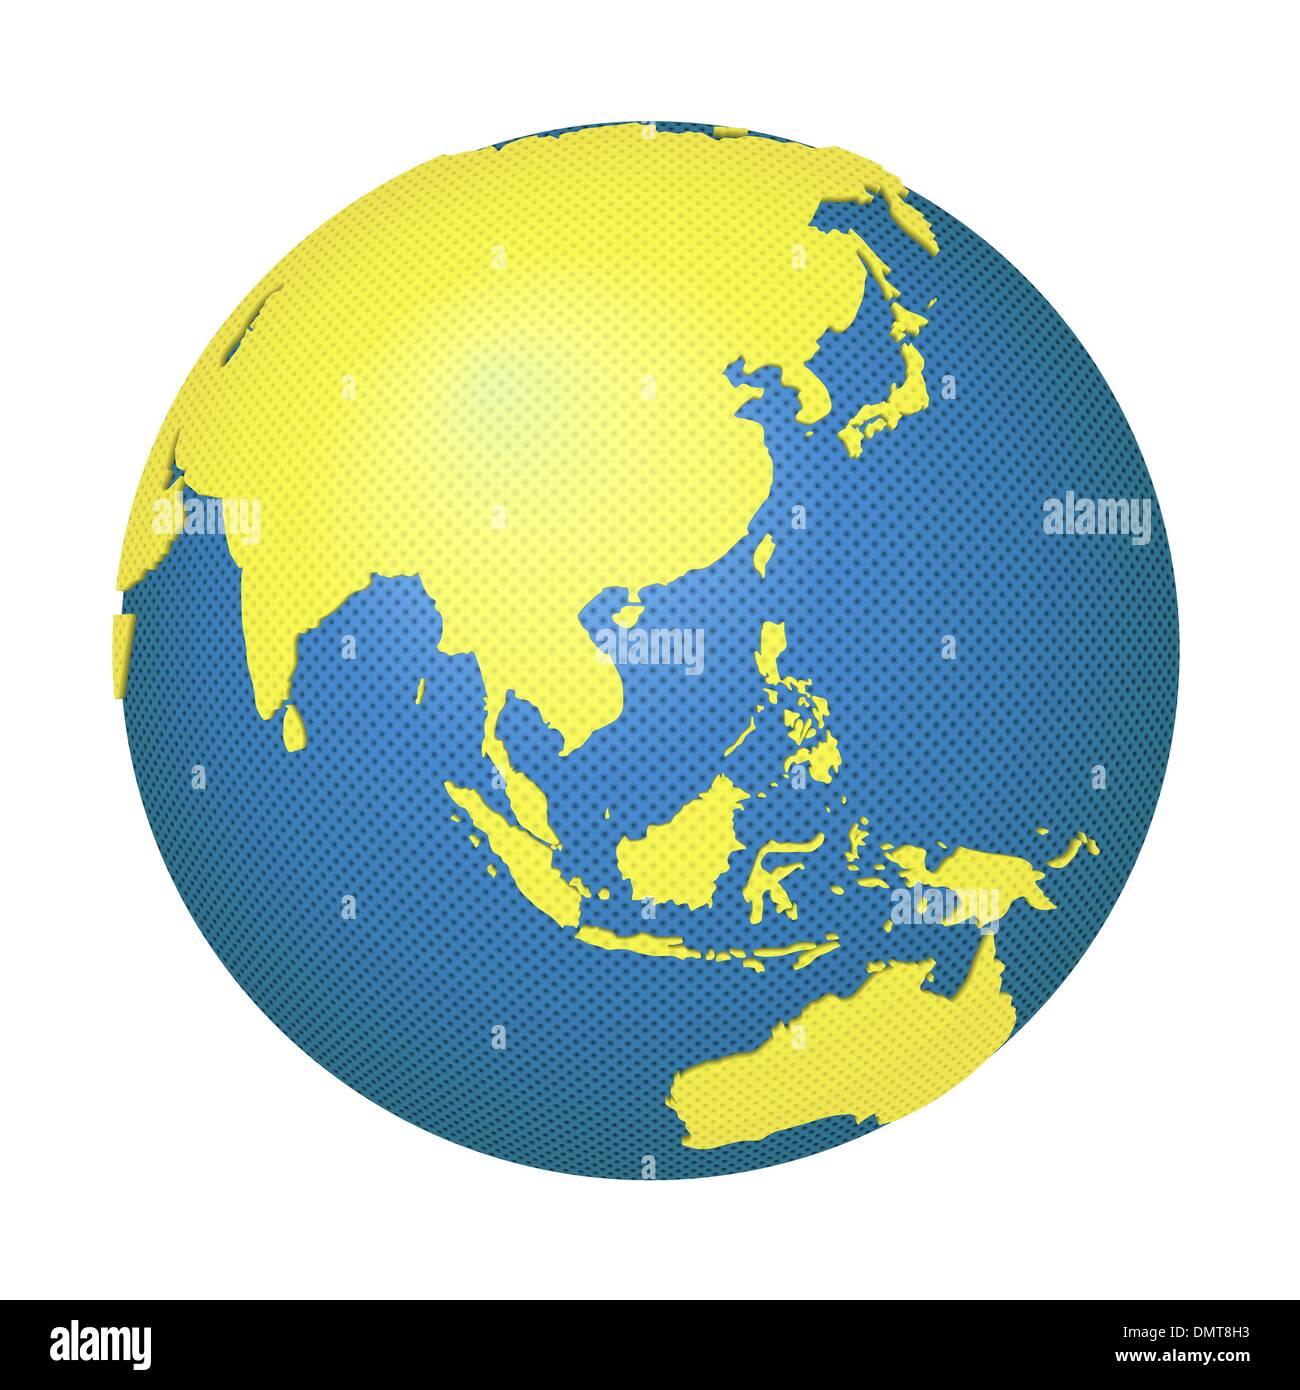 Globe with Asia and Australia - Stock Image